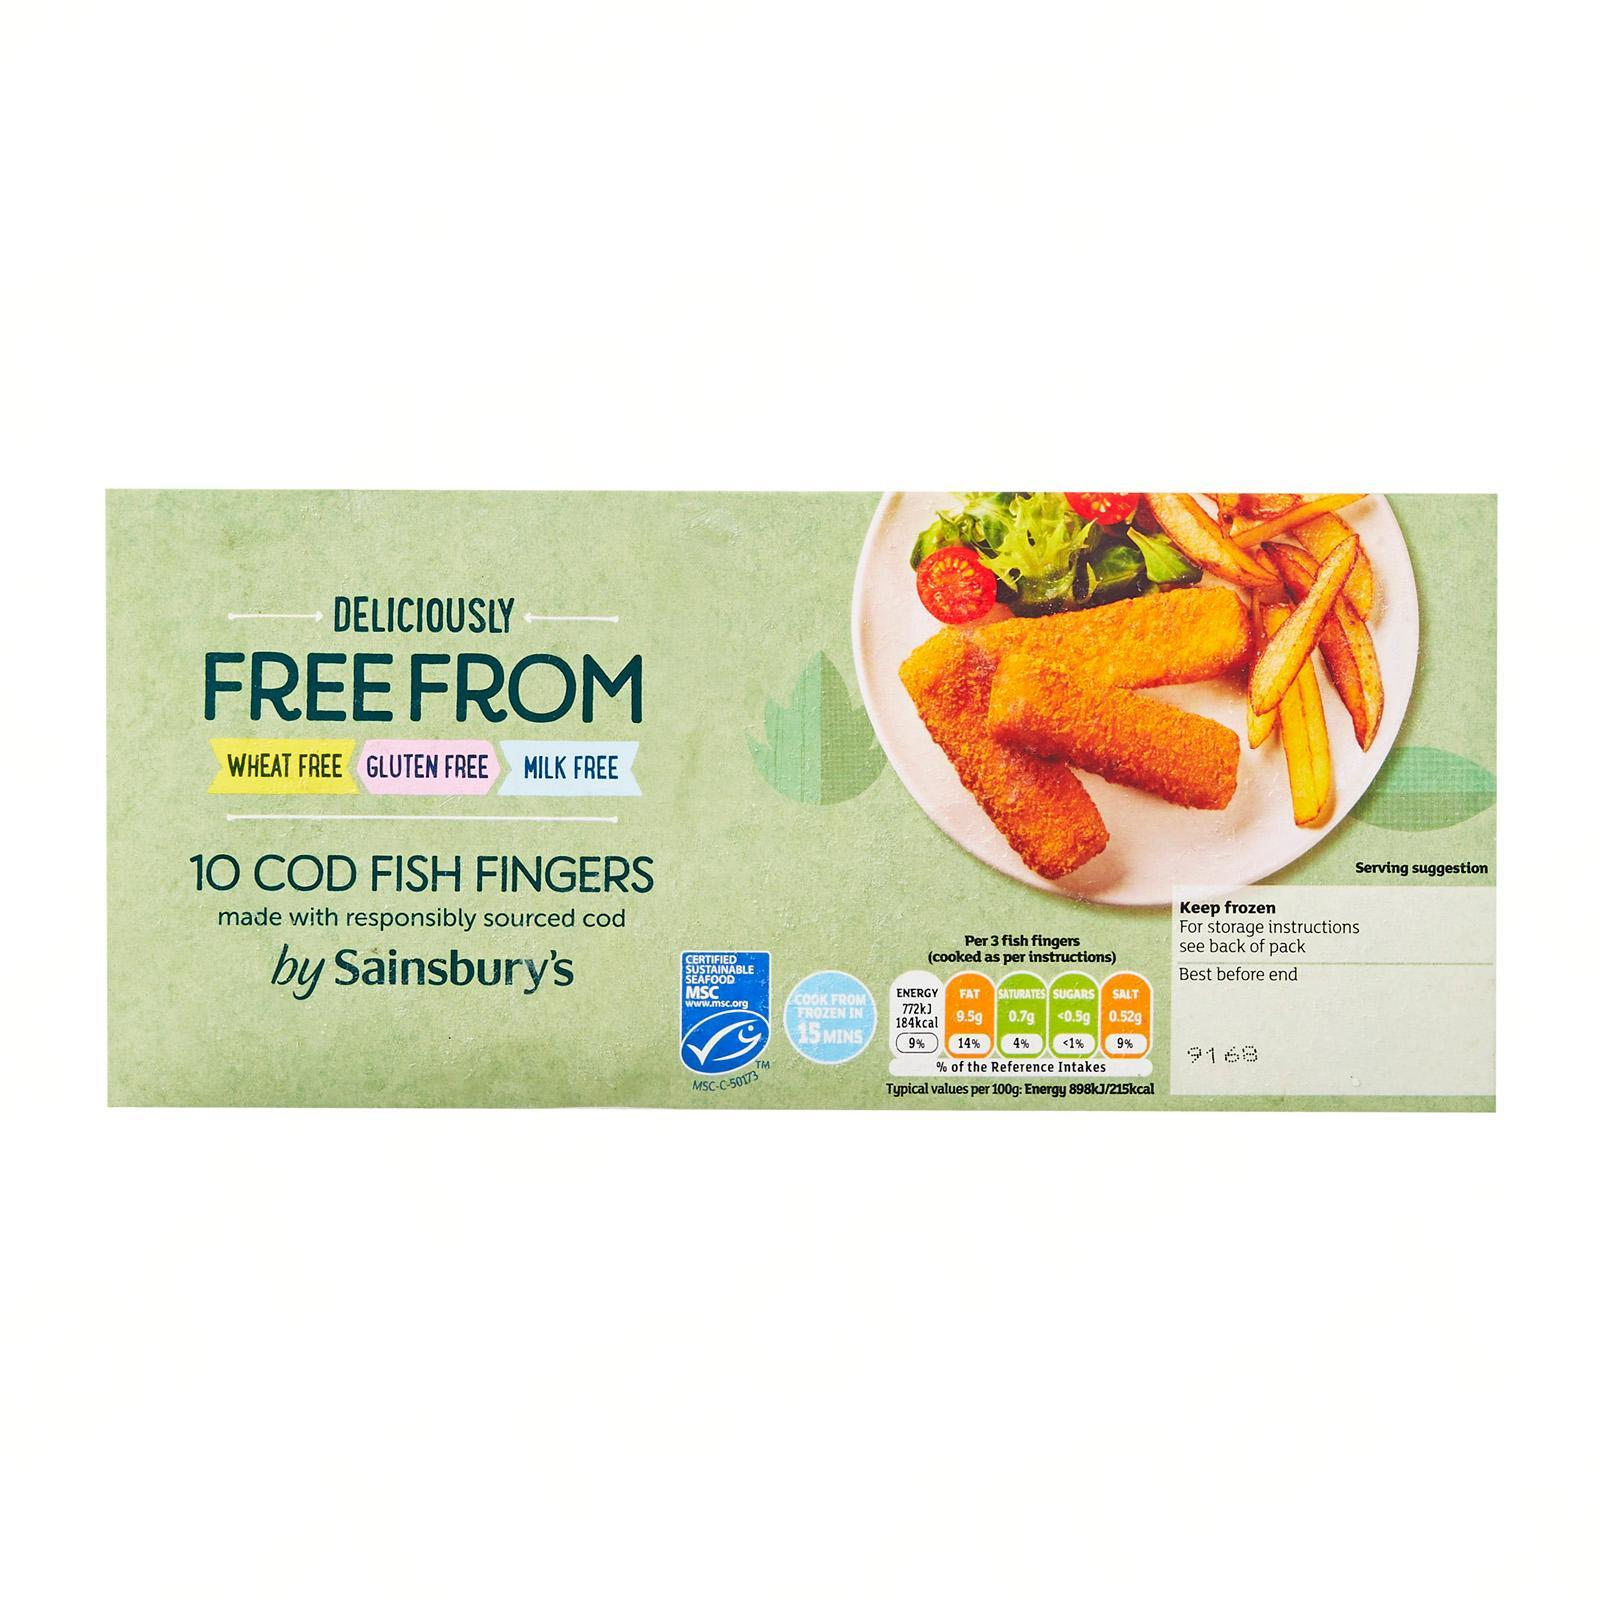 Sainsbury's Cod Fish Fingers - Frozen